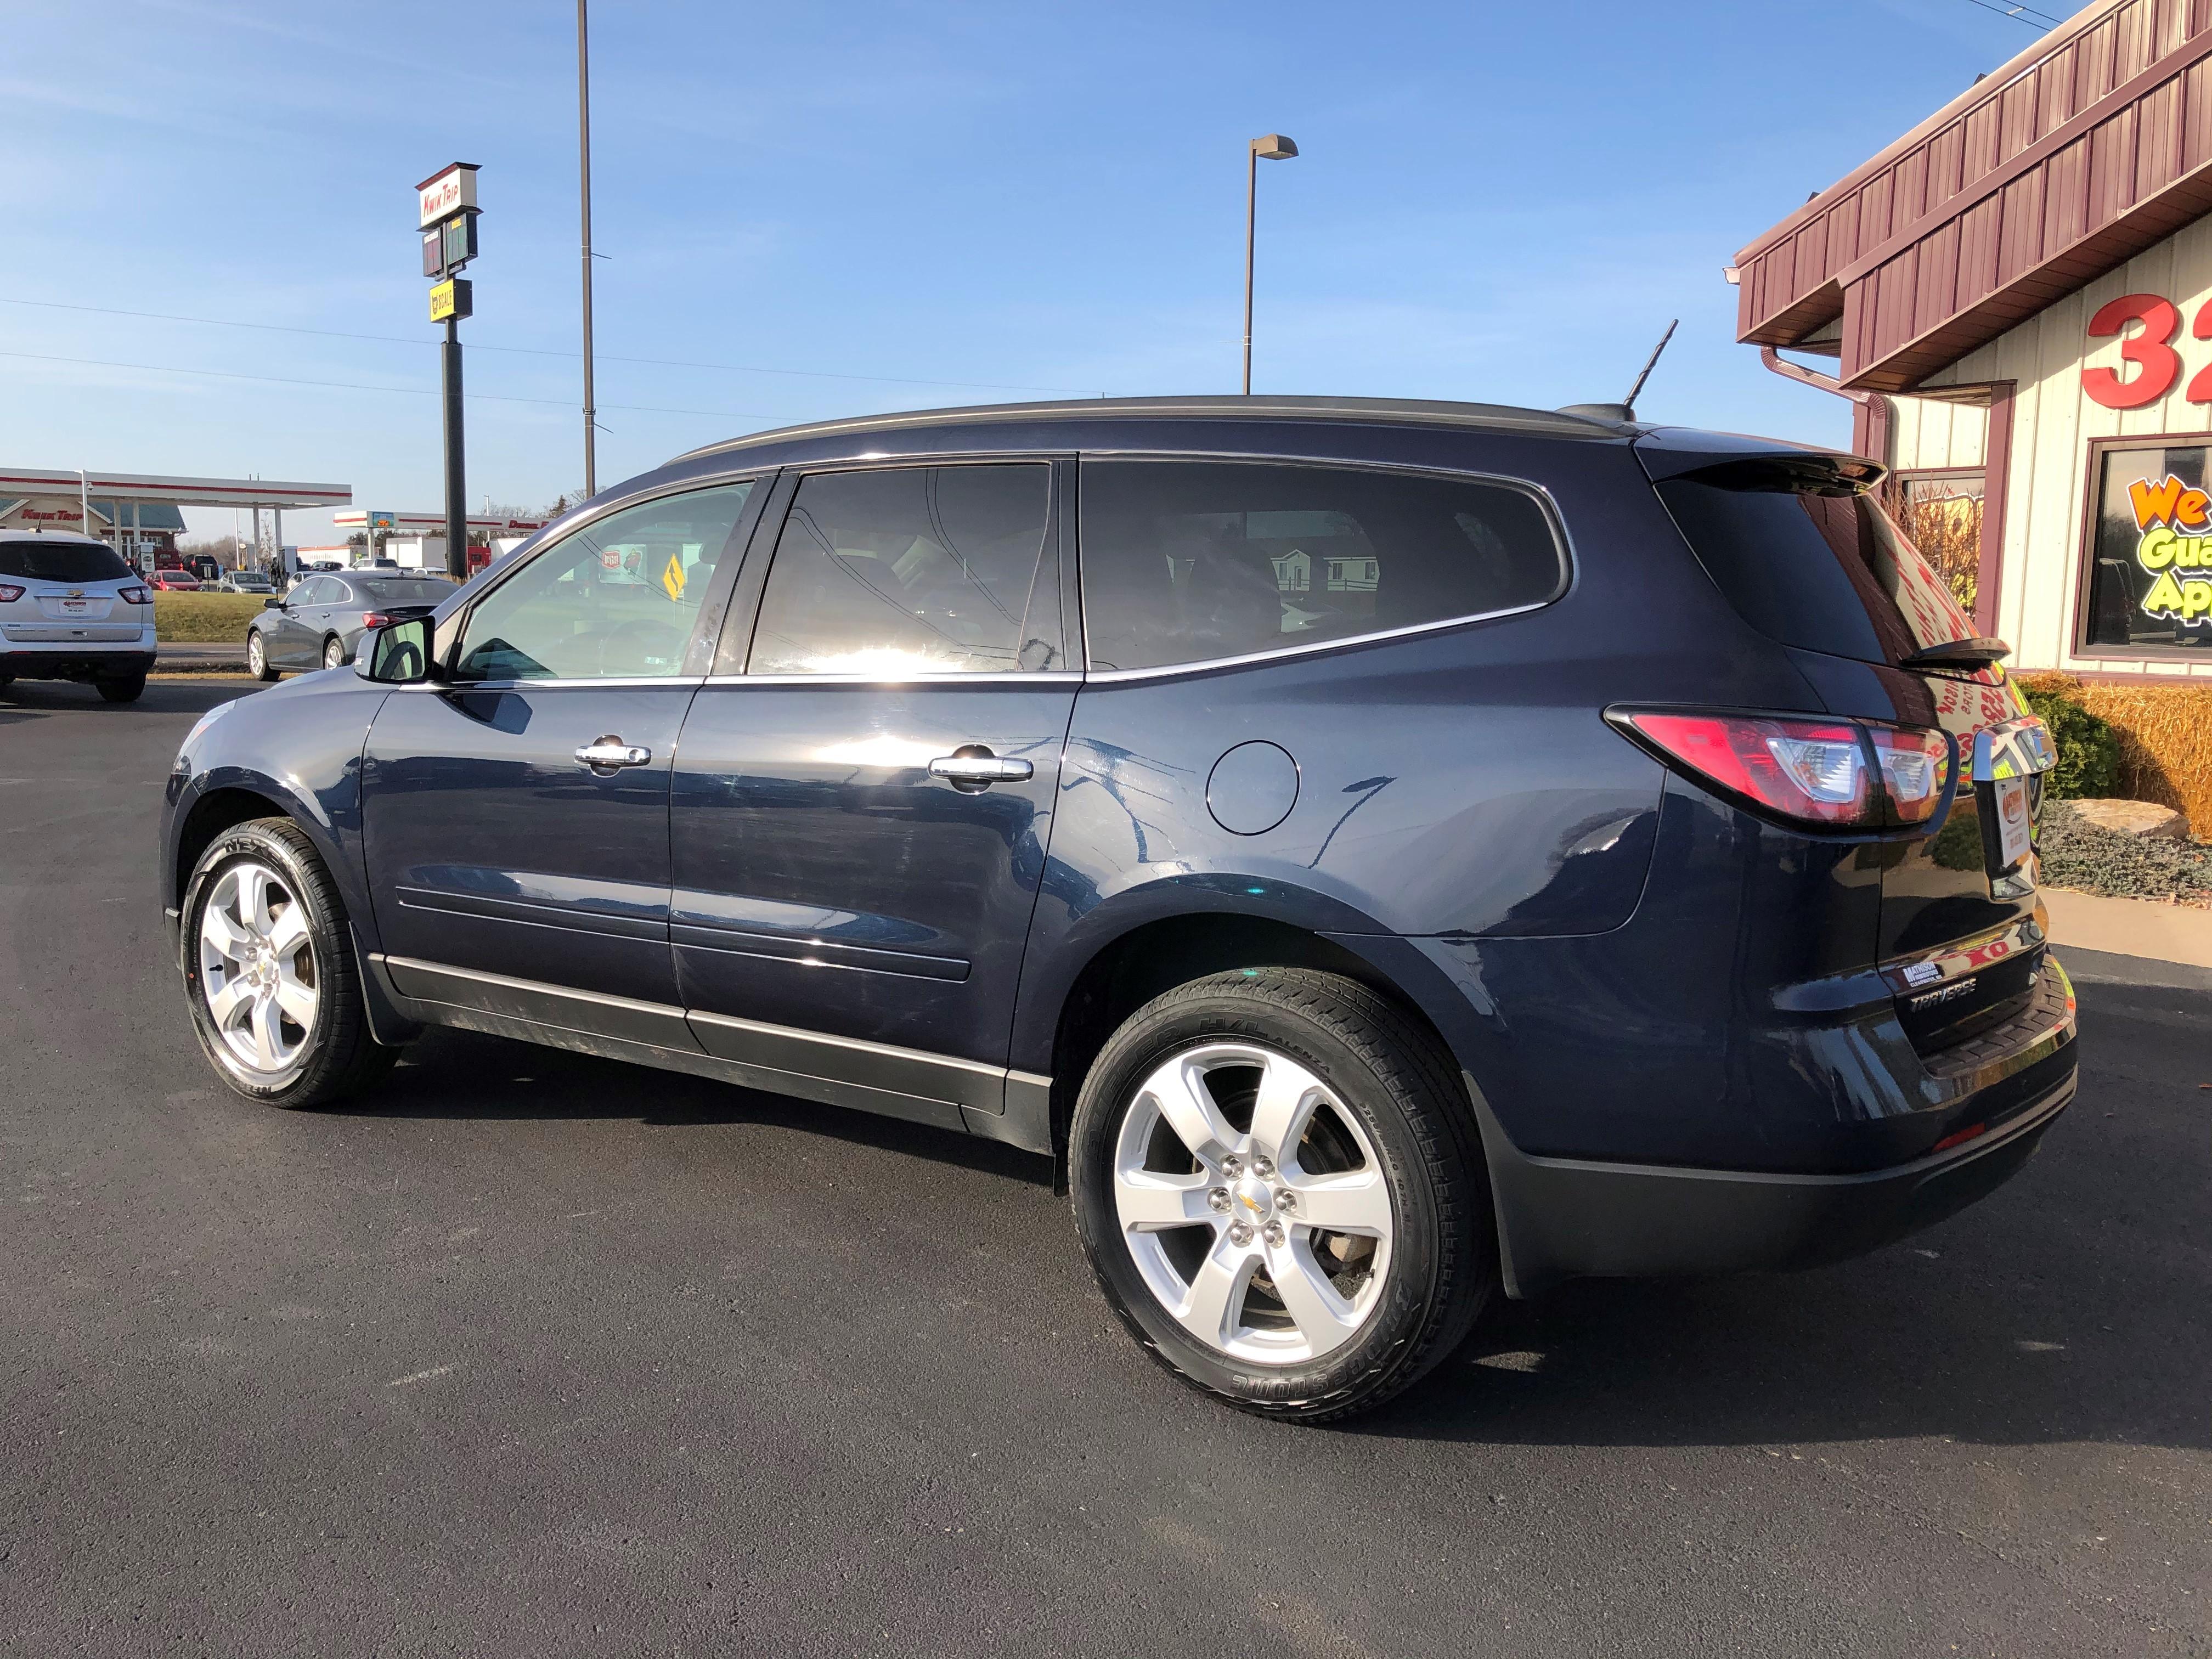 used vehicle - SUV CHEVROLET TRAVERSE 2017